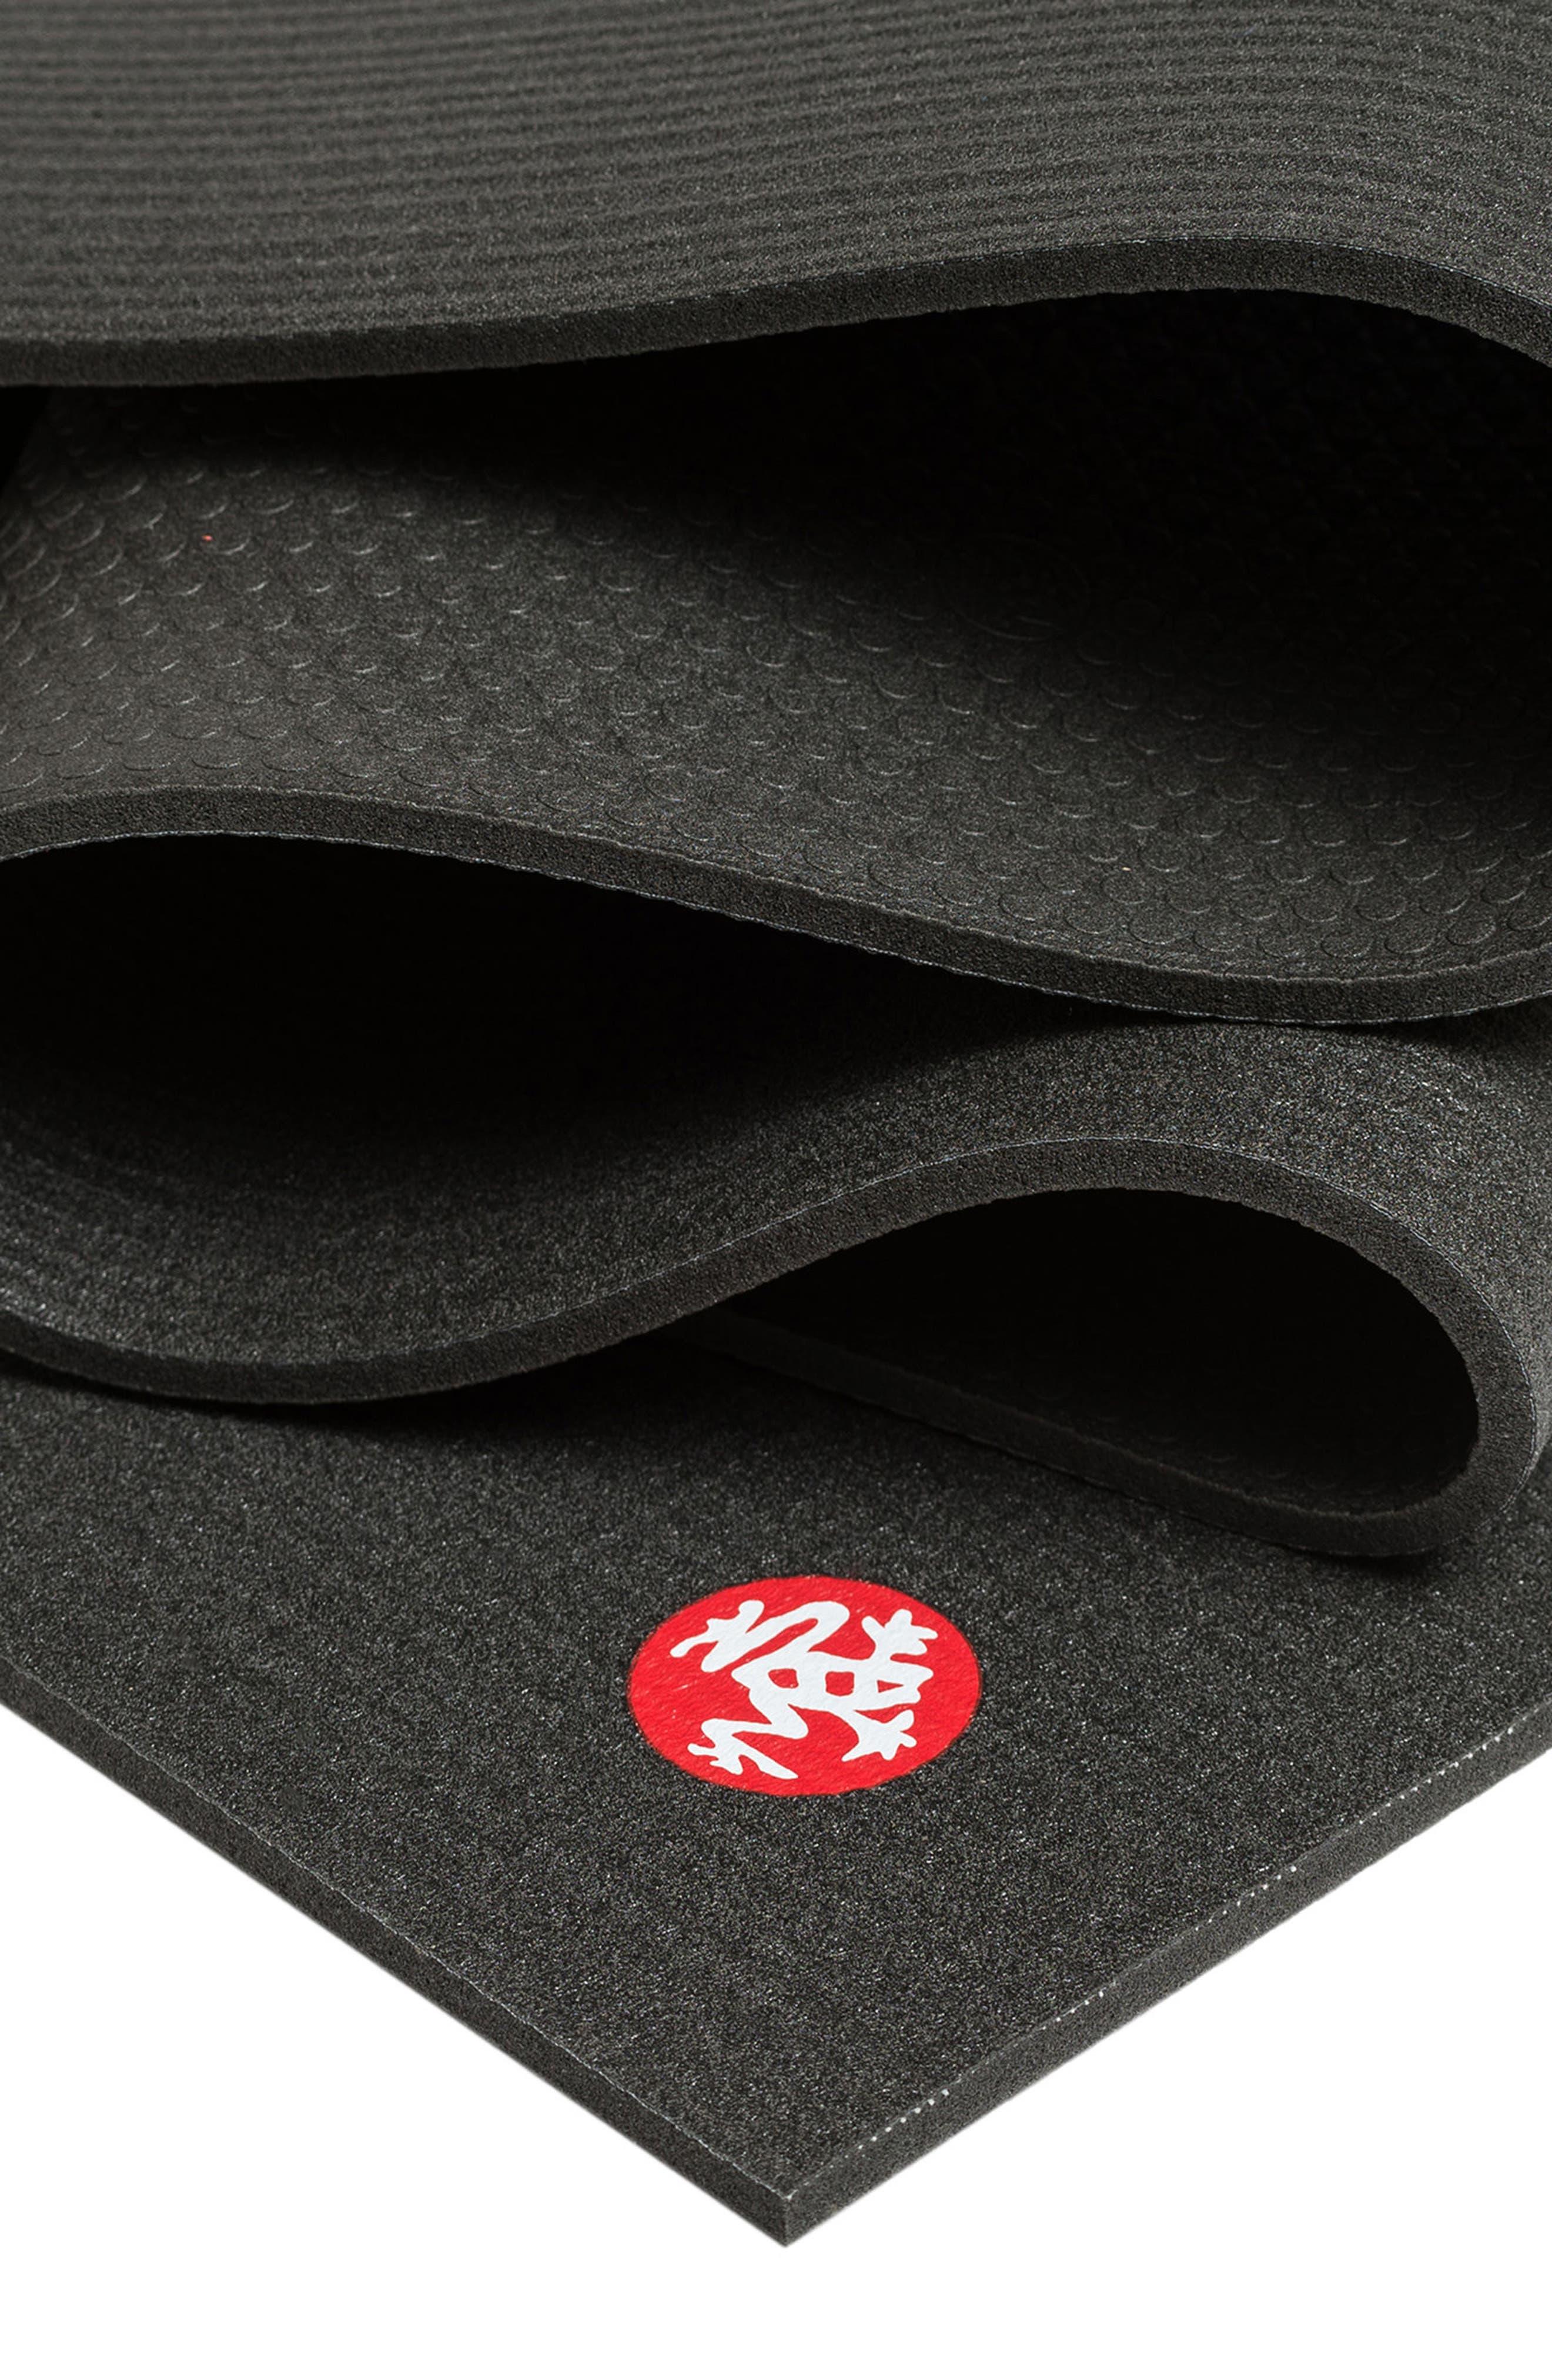 PROlite<sup>®</sup> Yoga Mat,                             Alternate thumbnail 4, color,                             Black